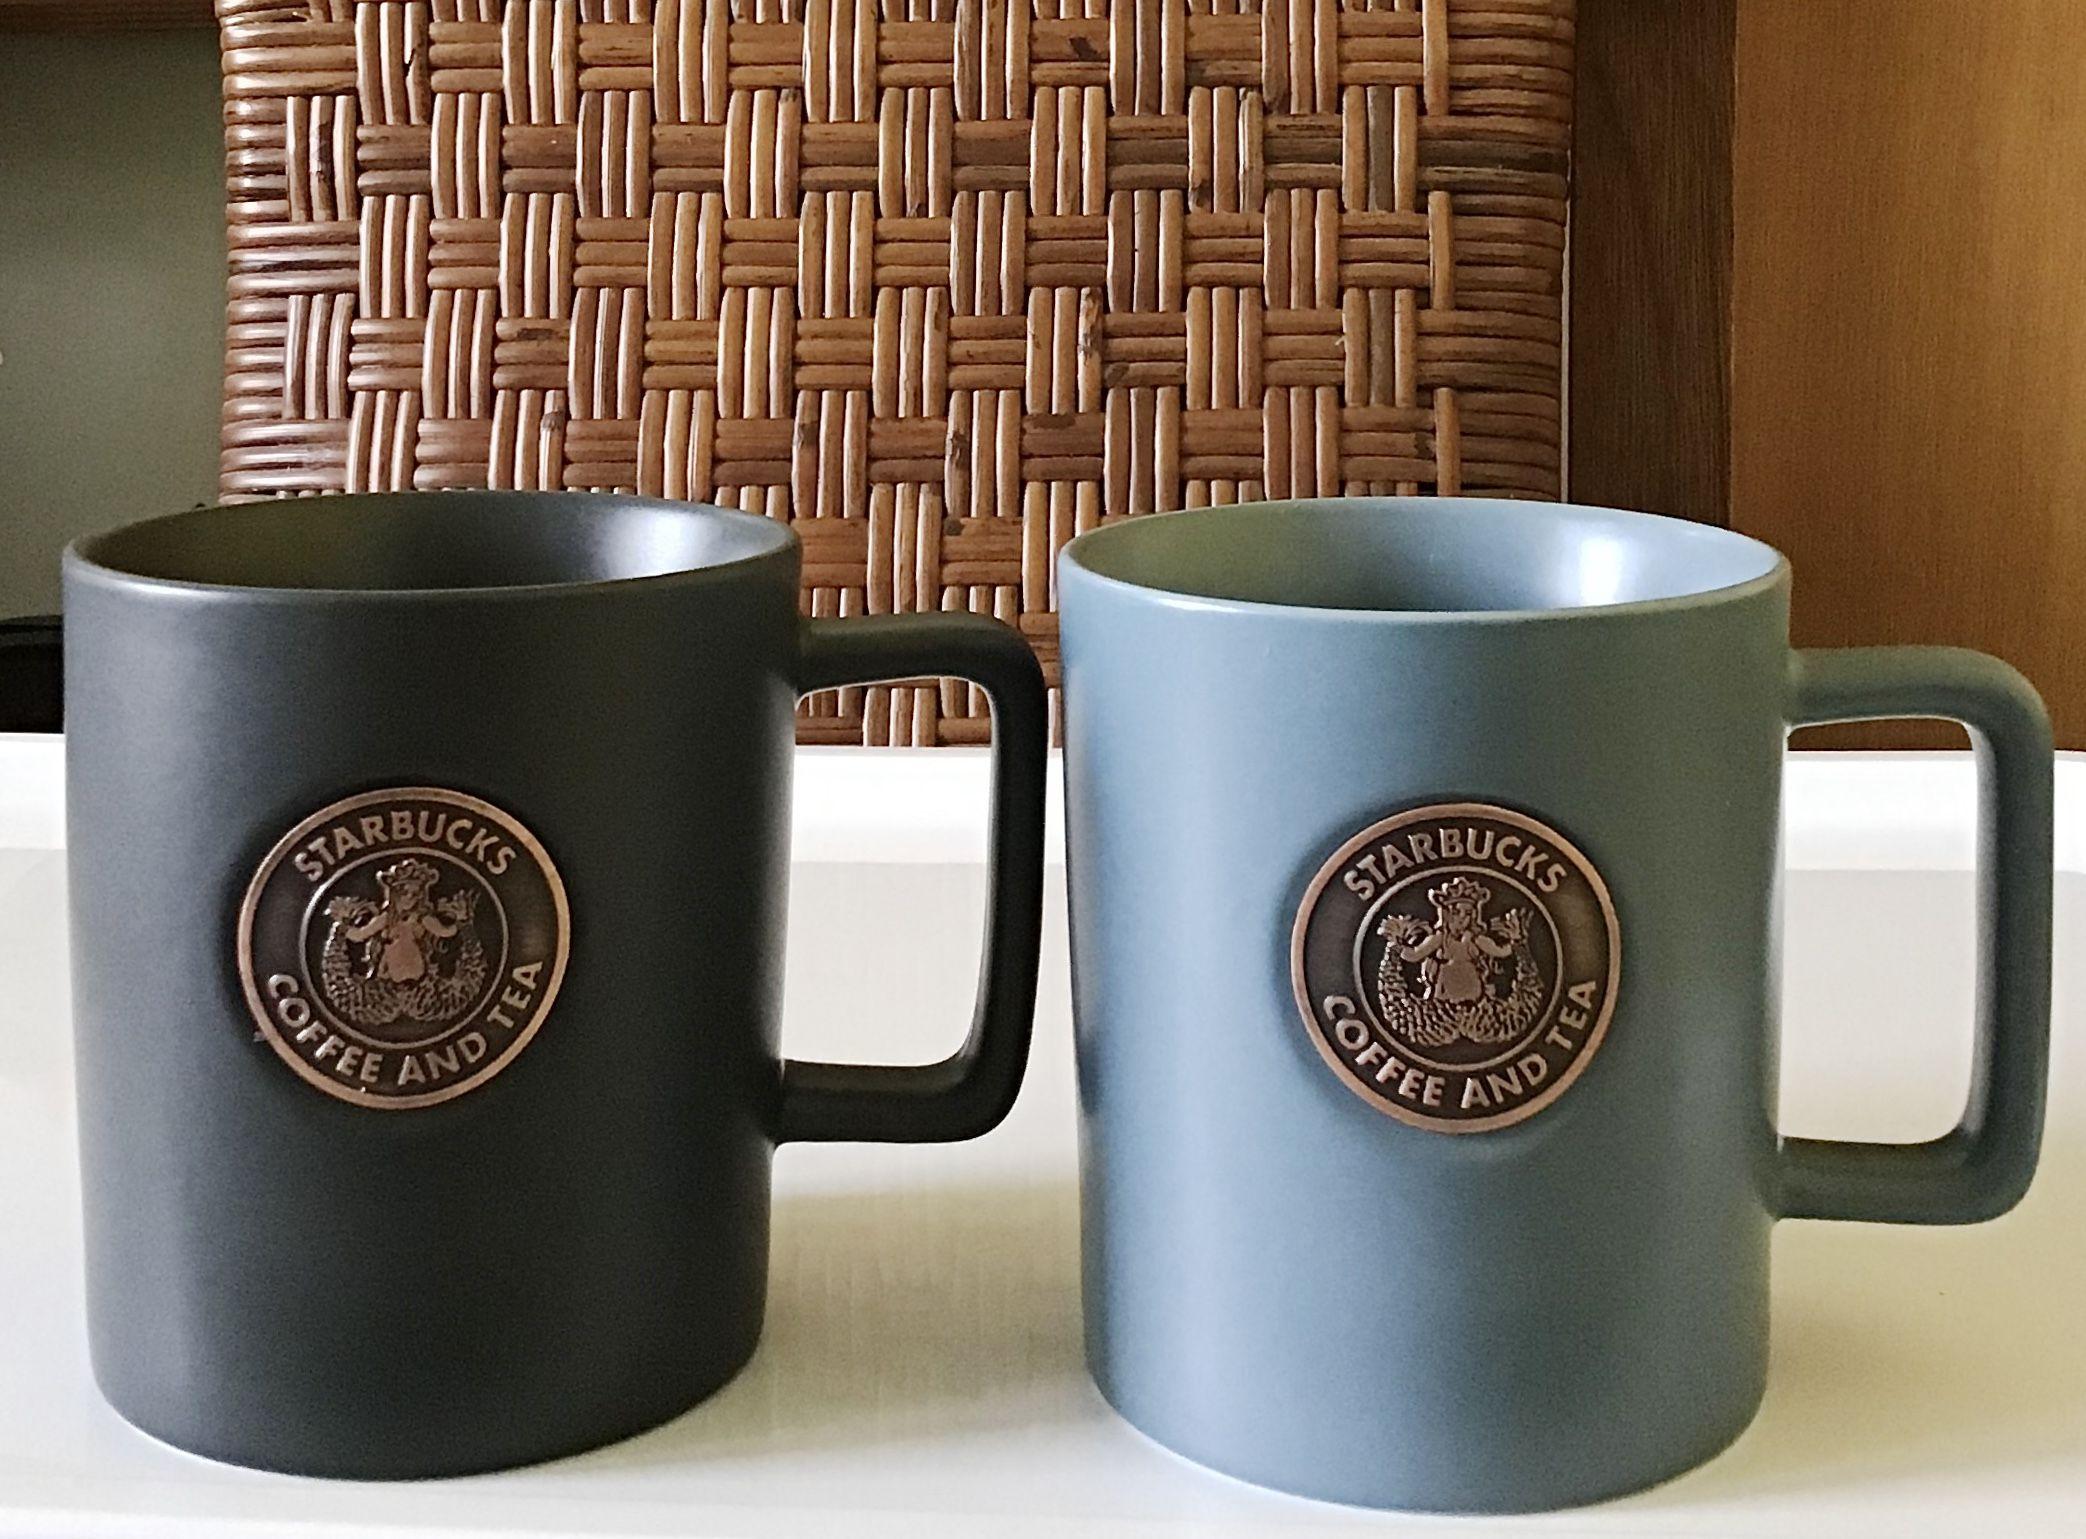 Pin by wlee on my fun starbucks collection mugs set